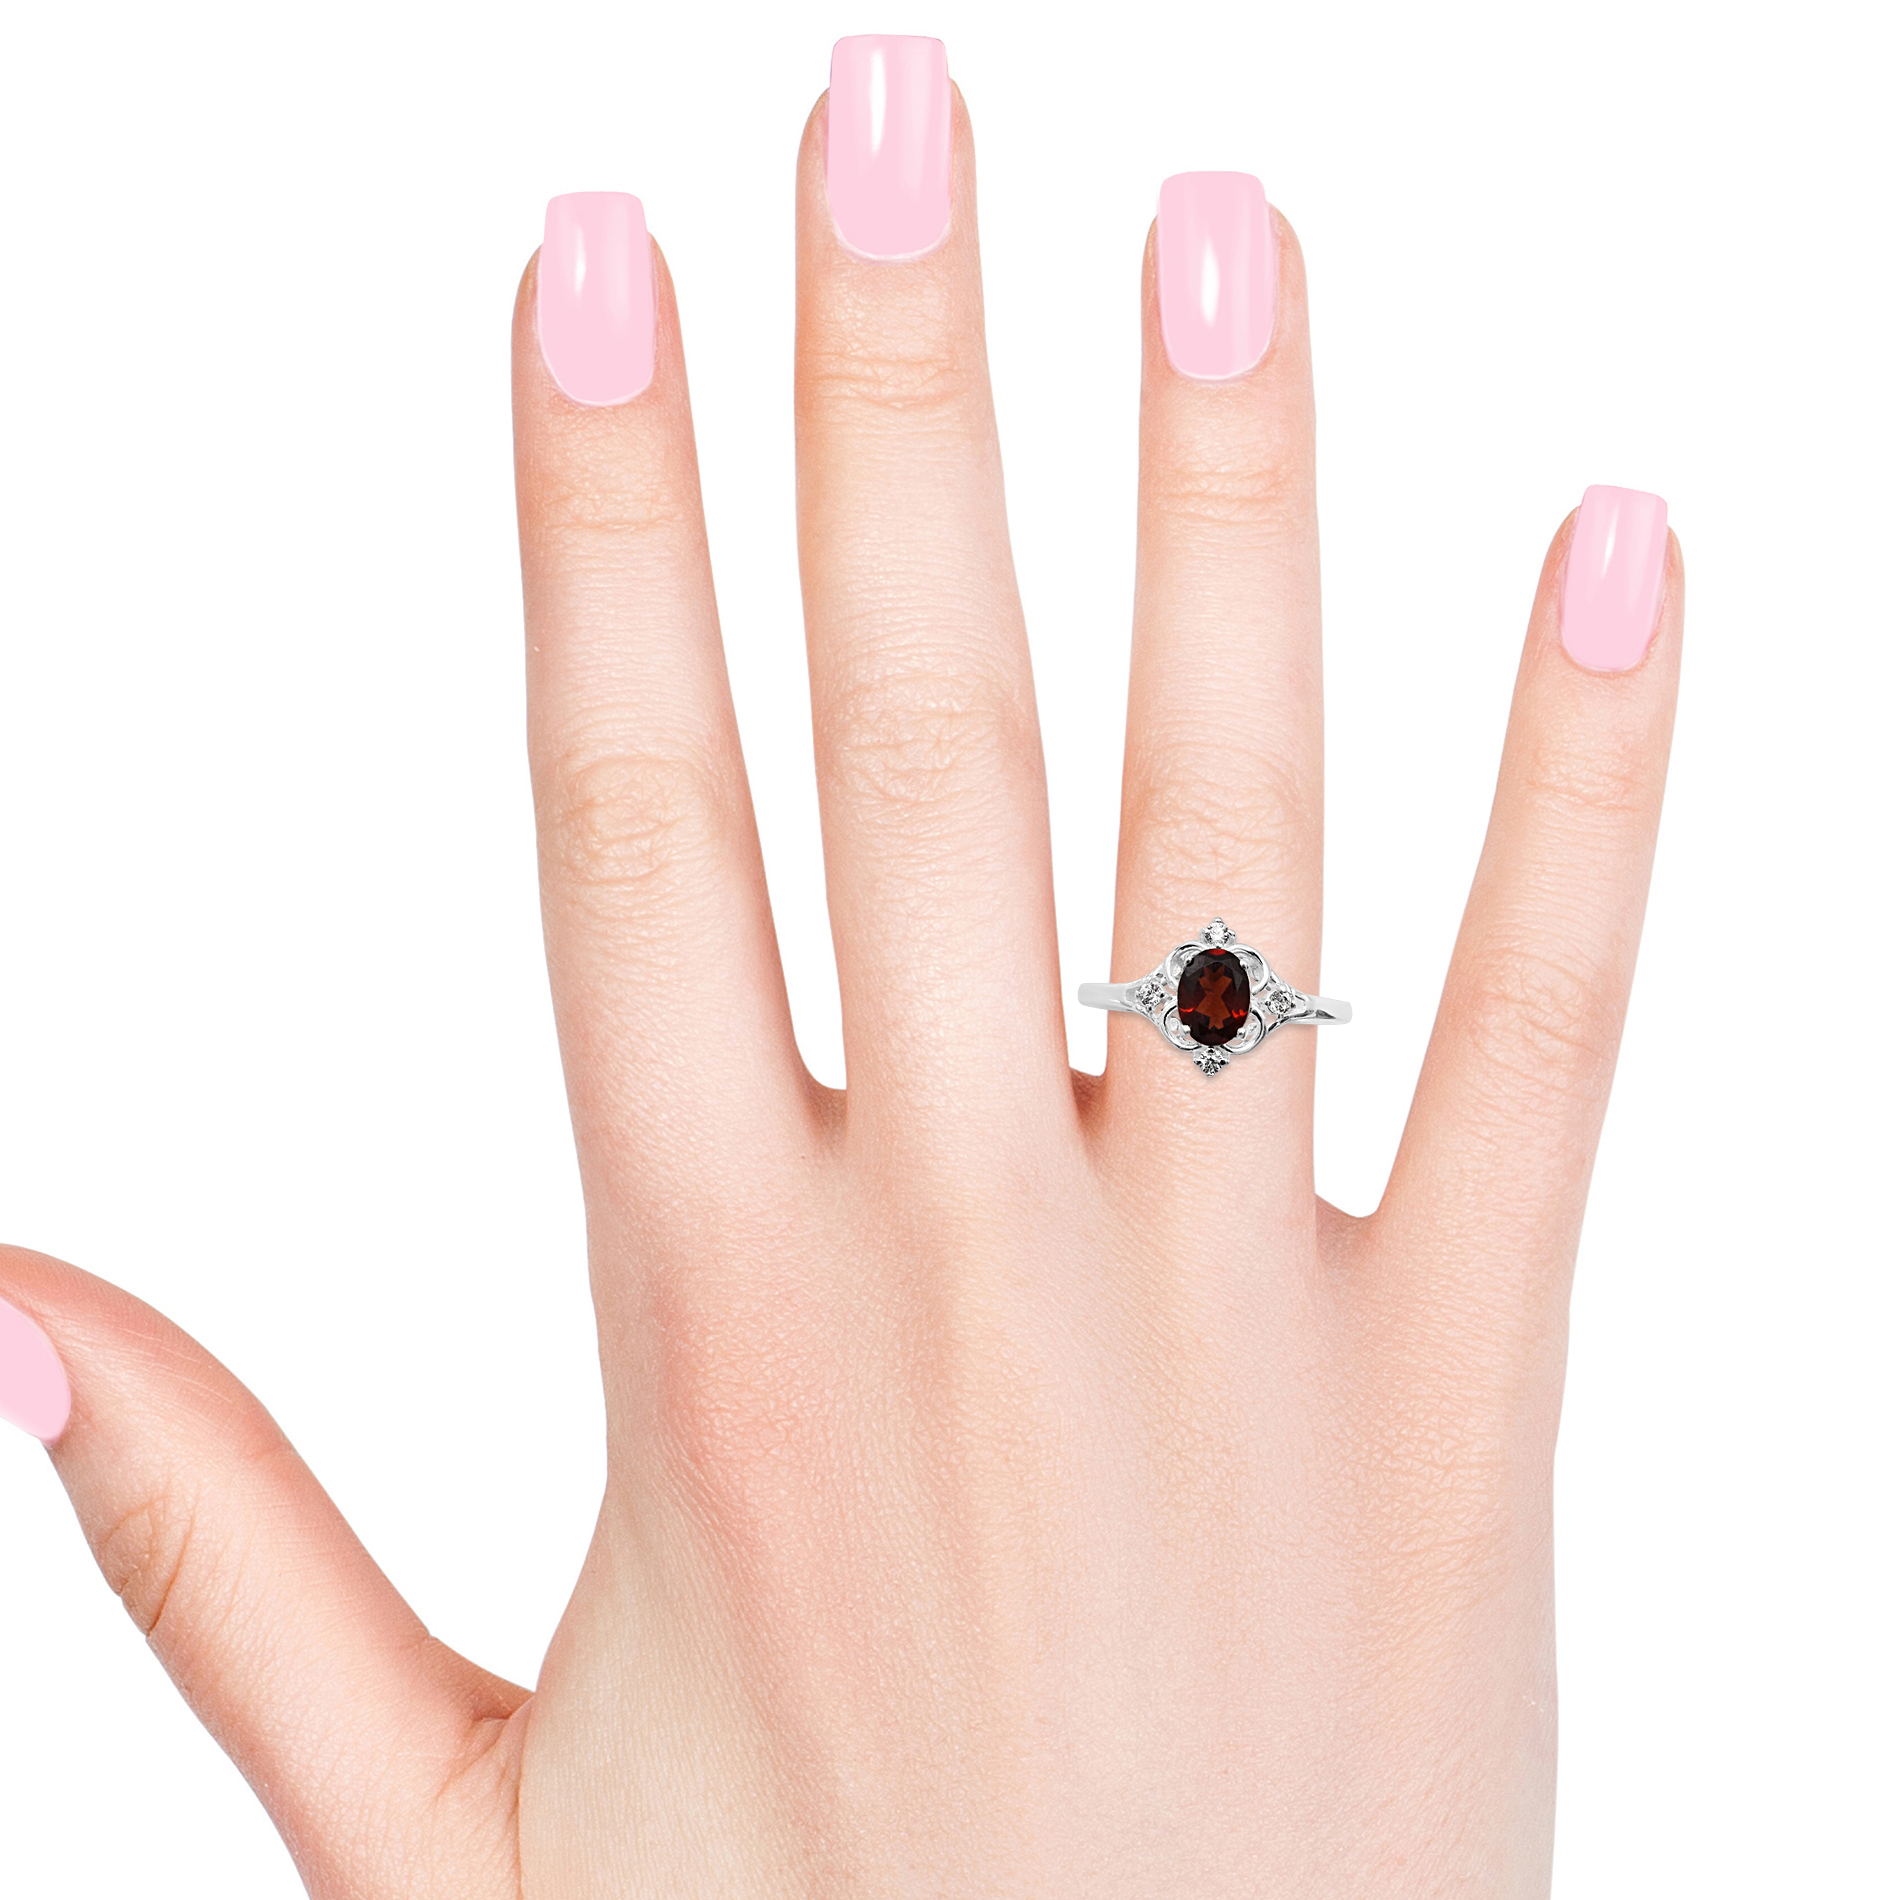 Mozambique Garnet, White CZ Sterling Silver Ring (Size 7.0) 1.63 ctw